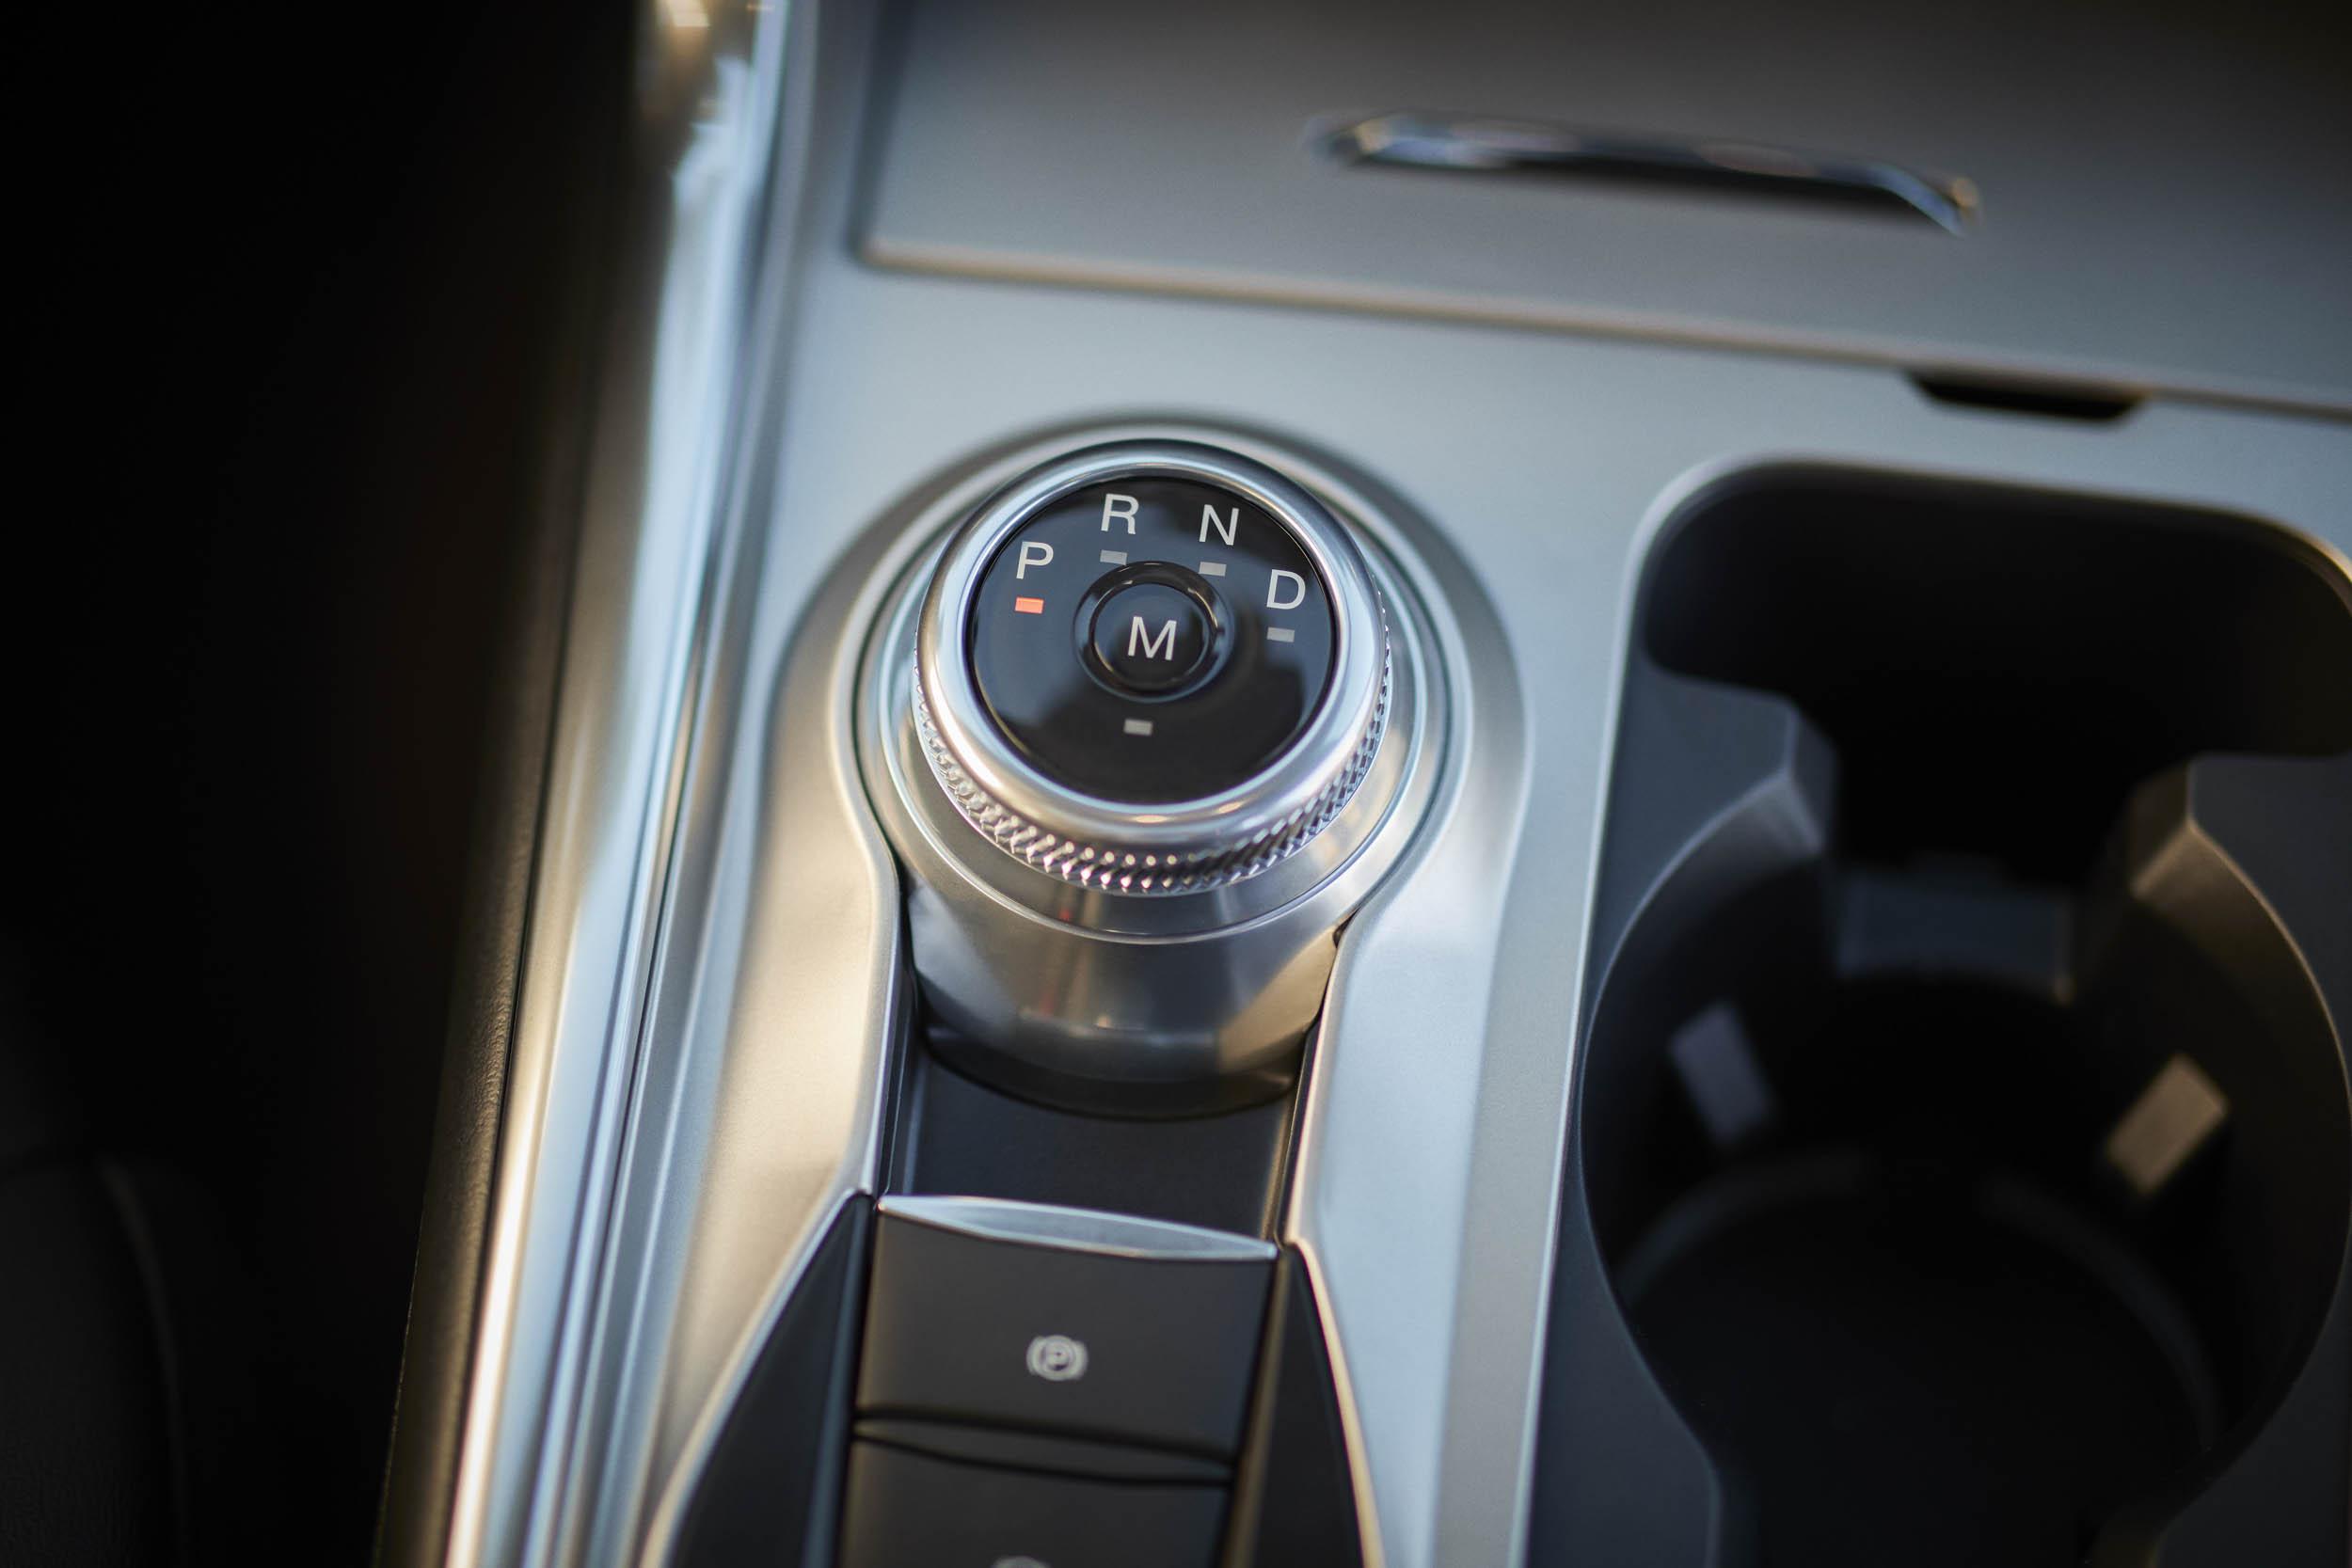 2020 Ford Explorer Platinum shifter knob